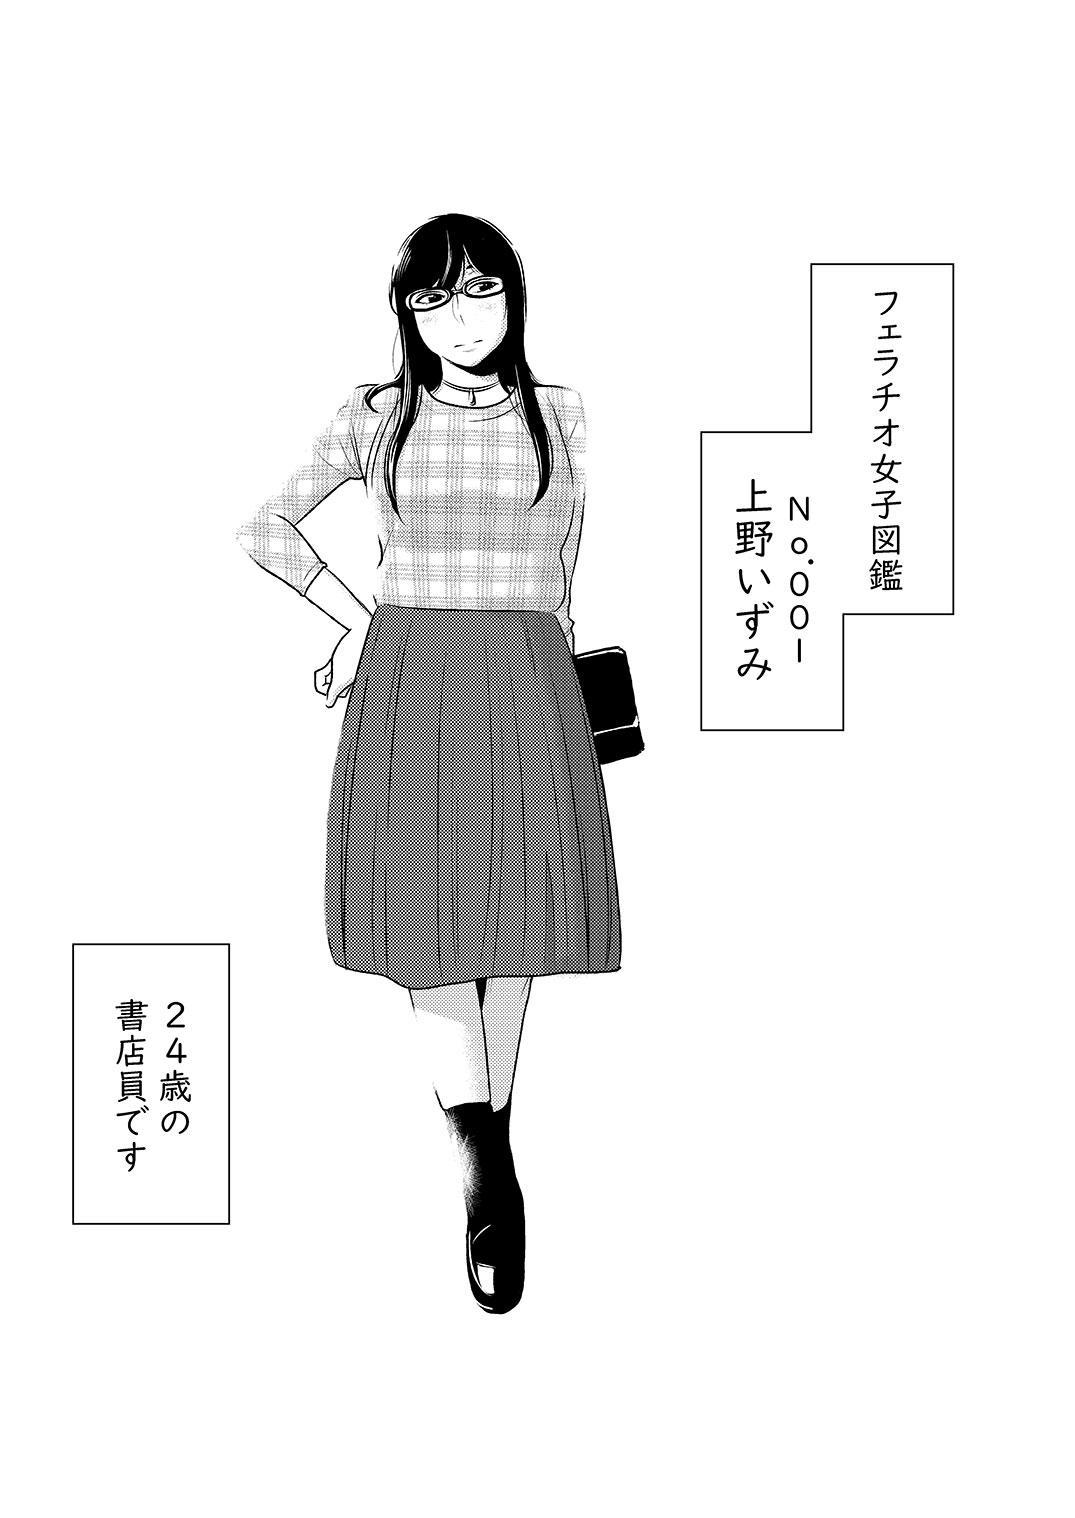 Fellatio girl illustrated book 0